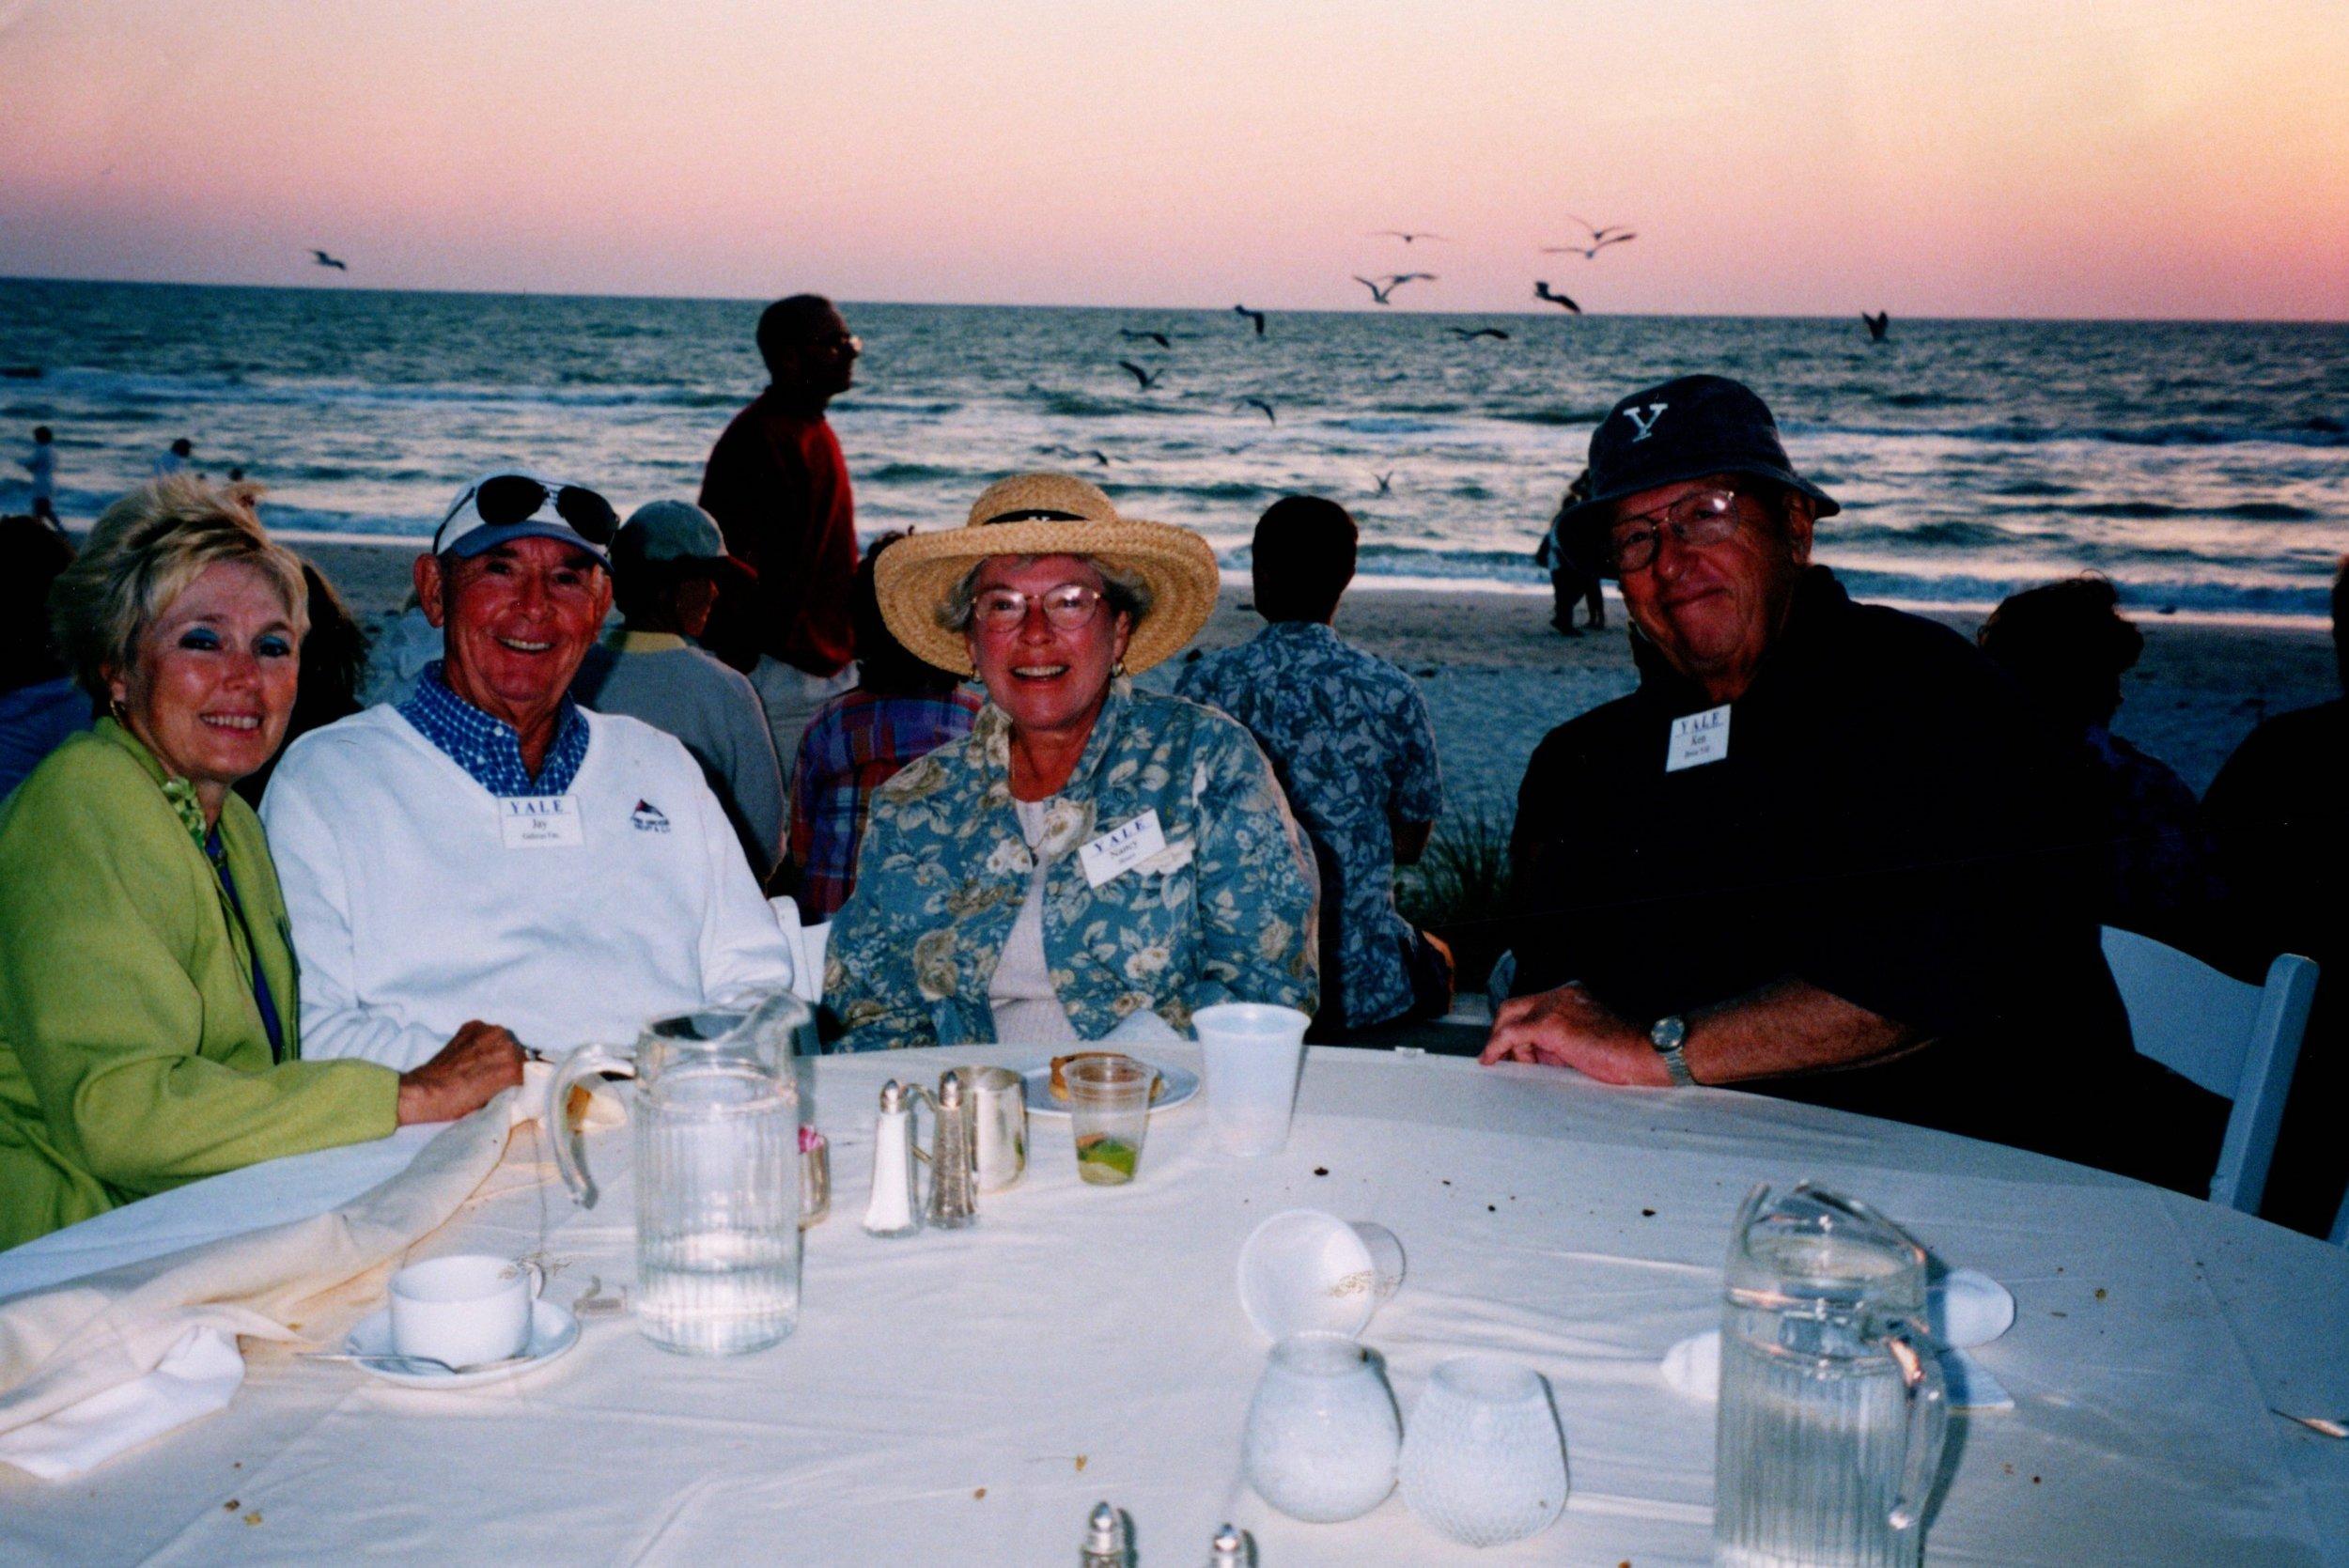 4_ 4_2004 - IVY LEAGUE PICNIC - NAPLES BEACH HOTEL 10.jpg